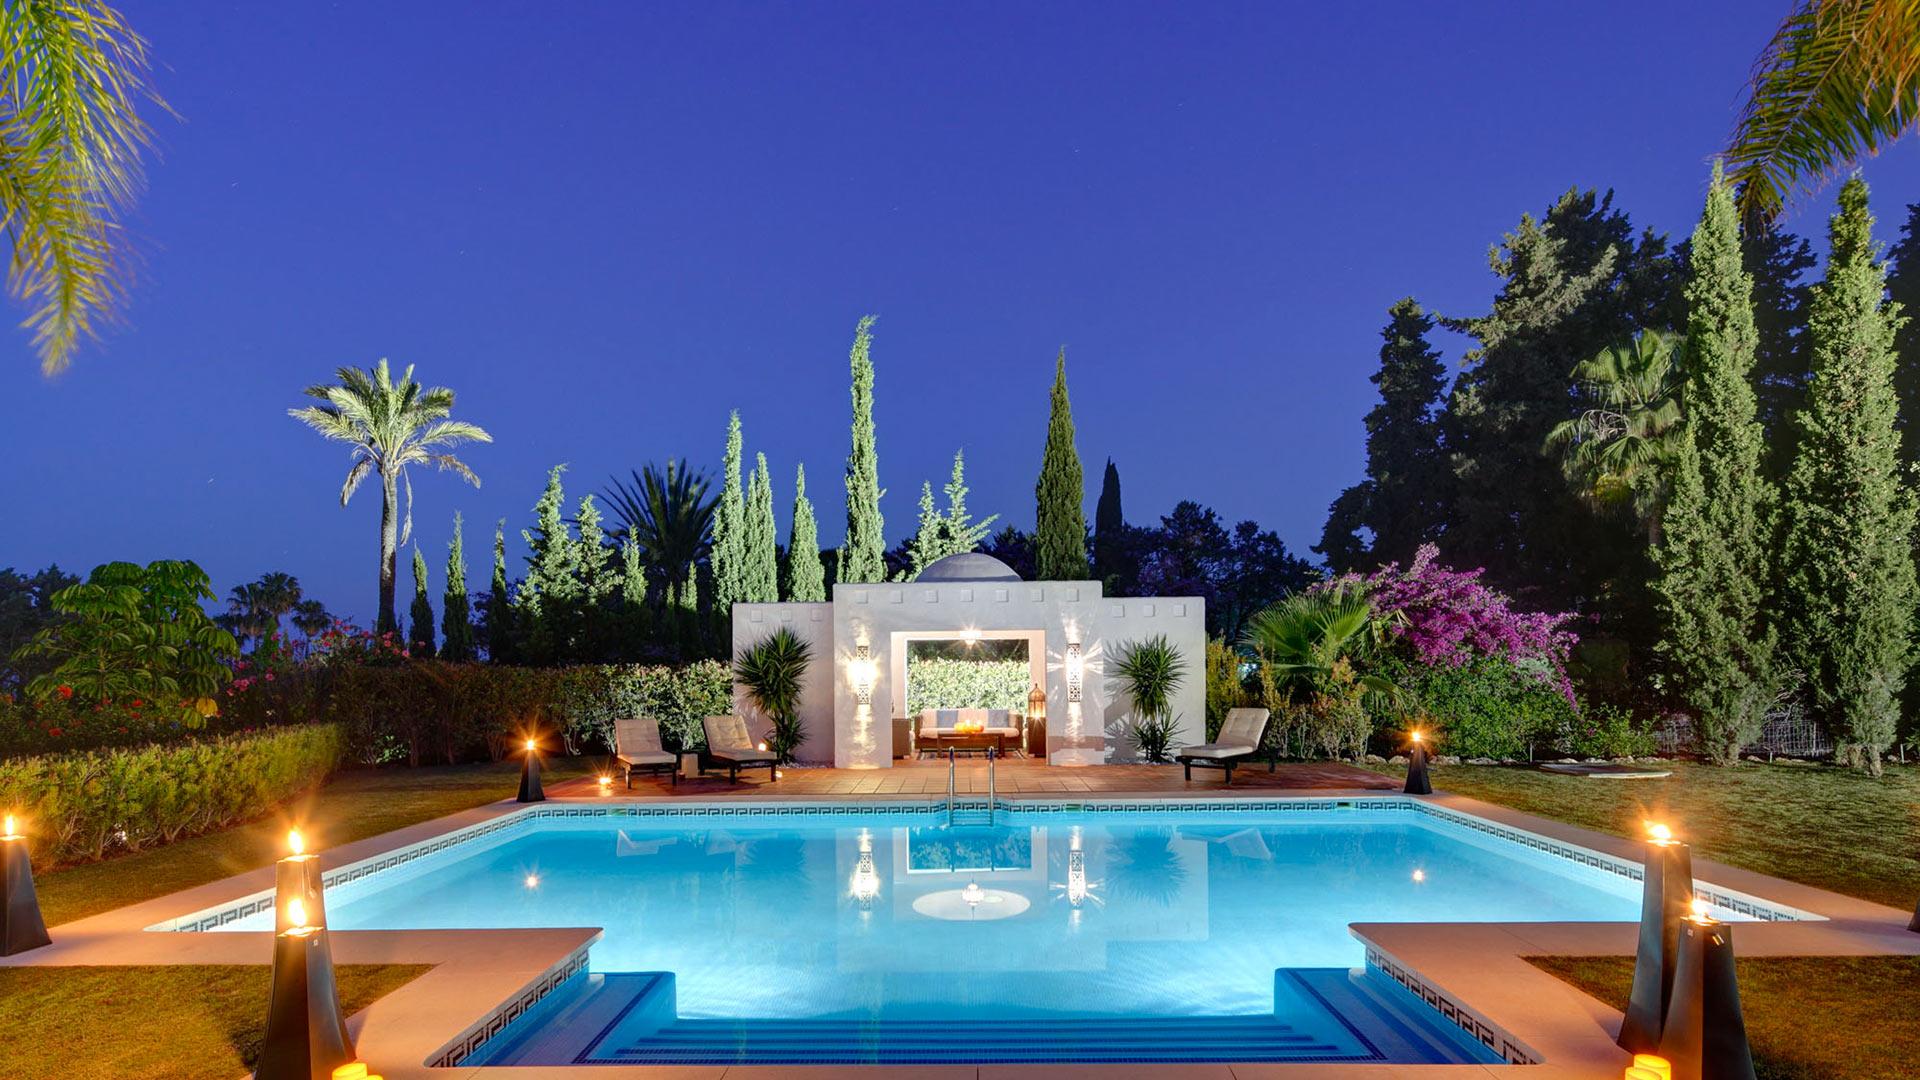 Villa Villa Rio Verde, Rental in Andalusia